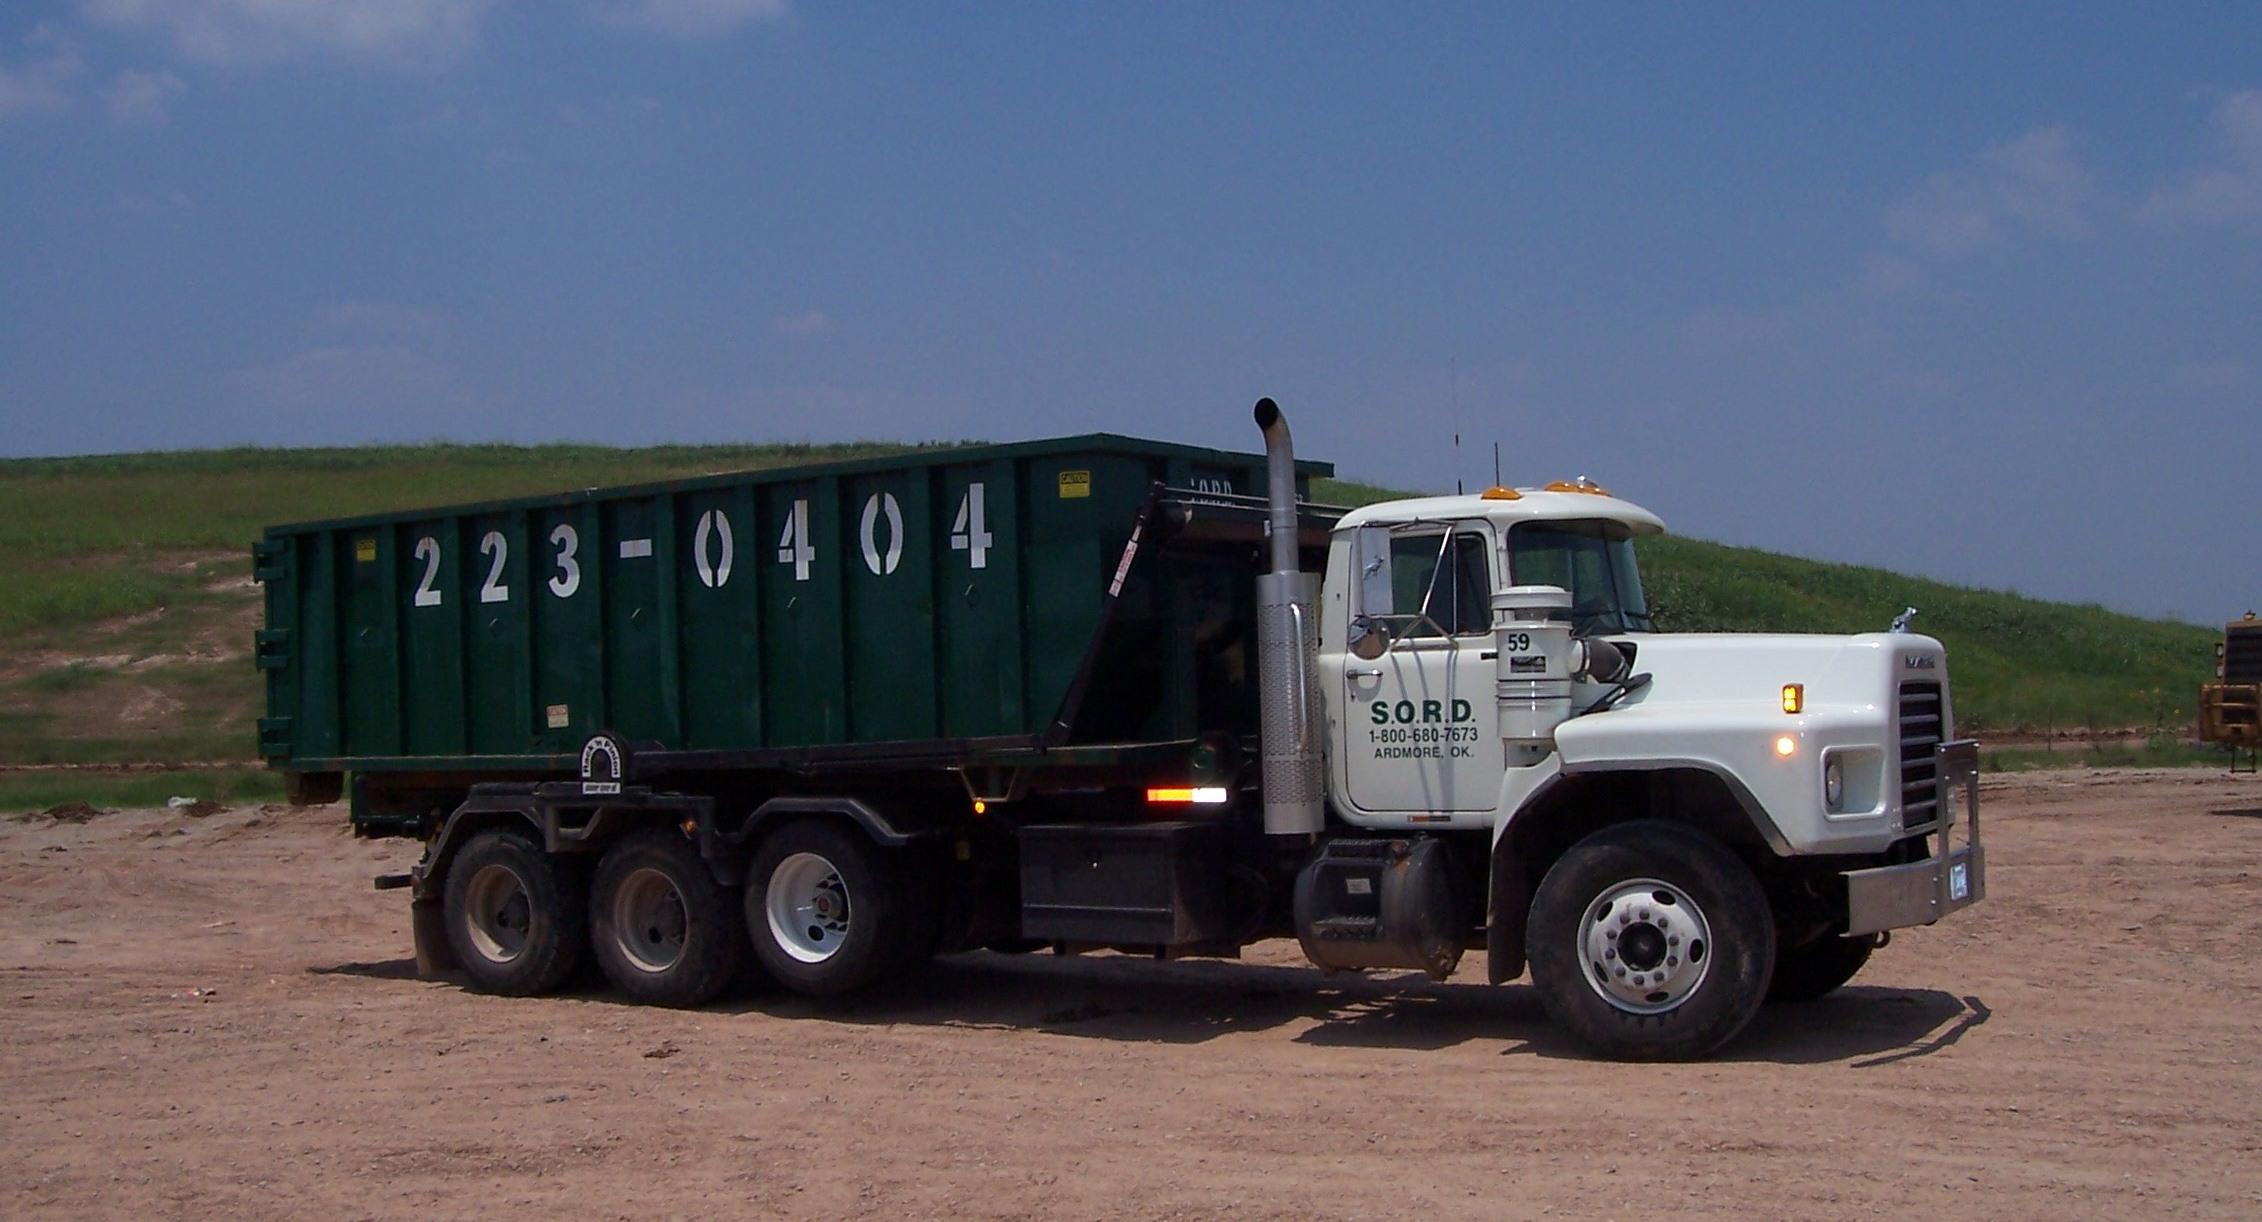 Southern Oklahoma Regional Disposal Service image 2